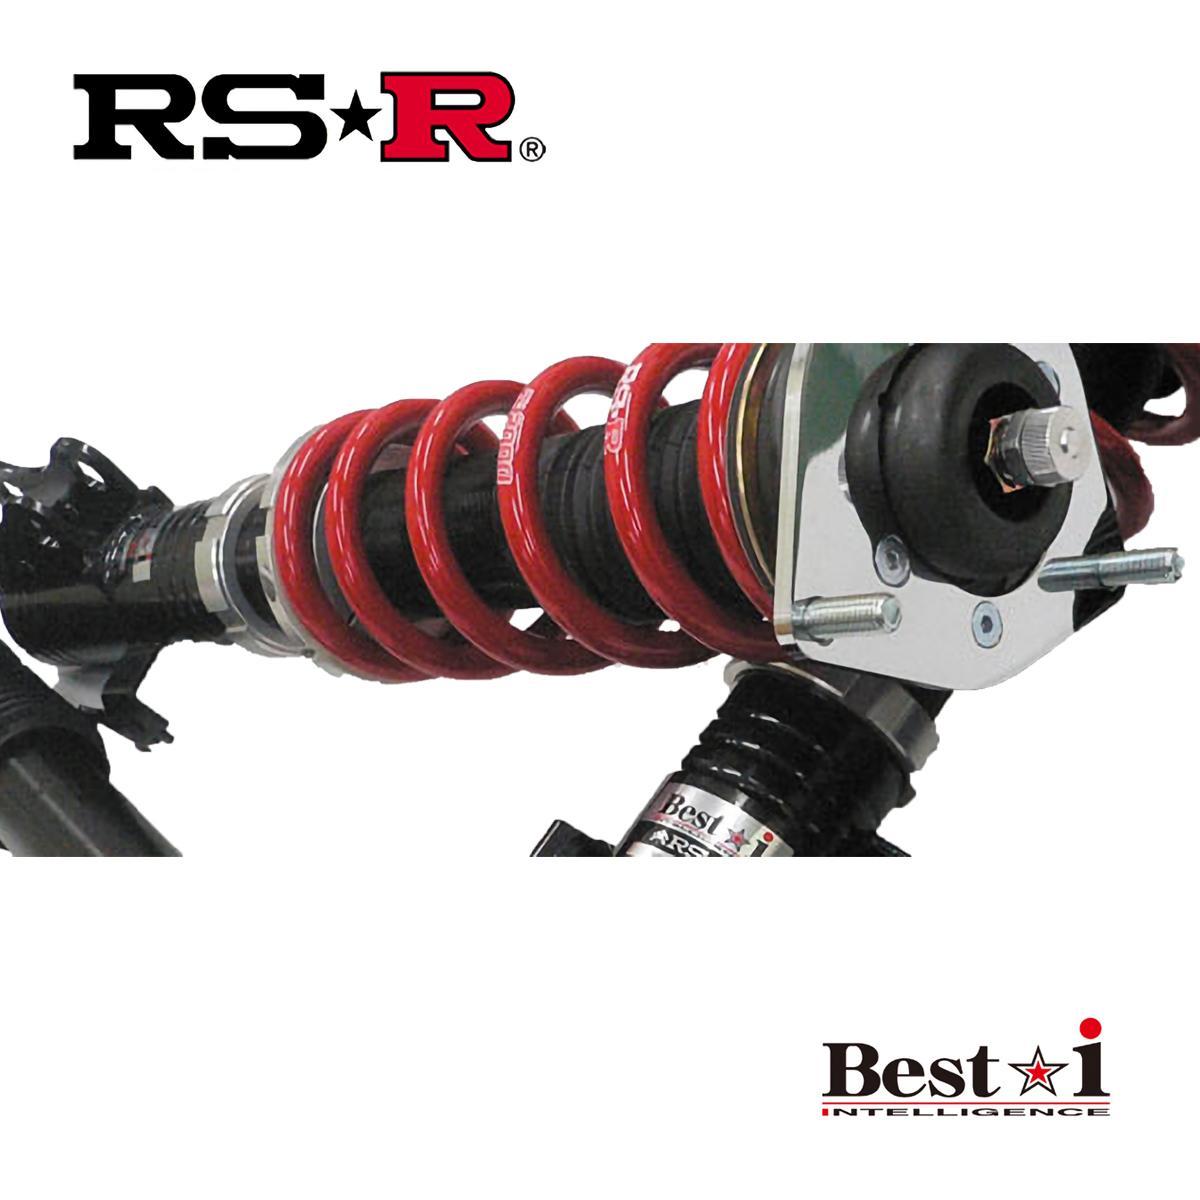 送料無料 RSR RS-R Luxury Best☆i クラウン GRS200 車高調 LIT290M LIT290S LIT290H RS-R